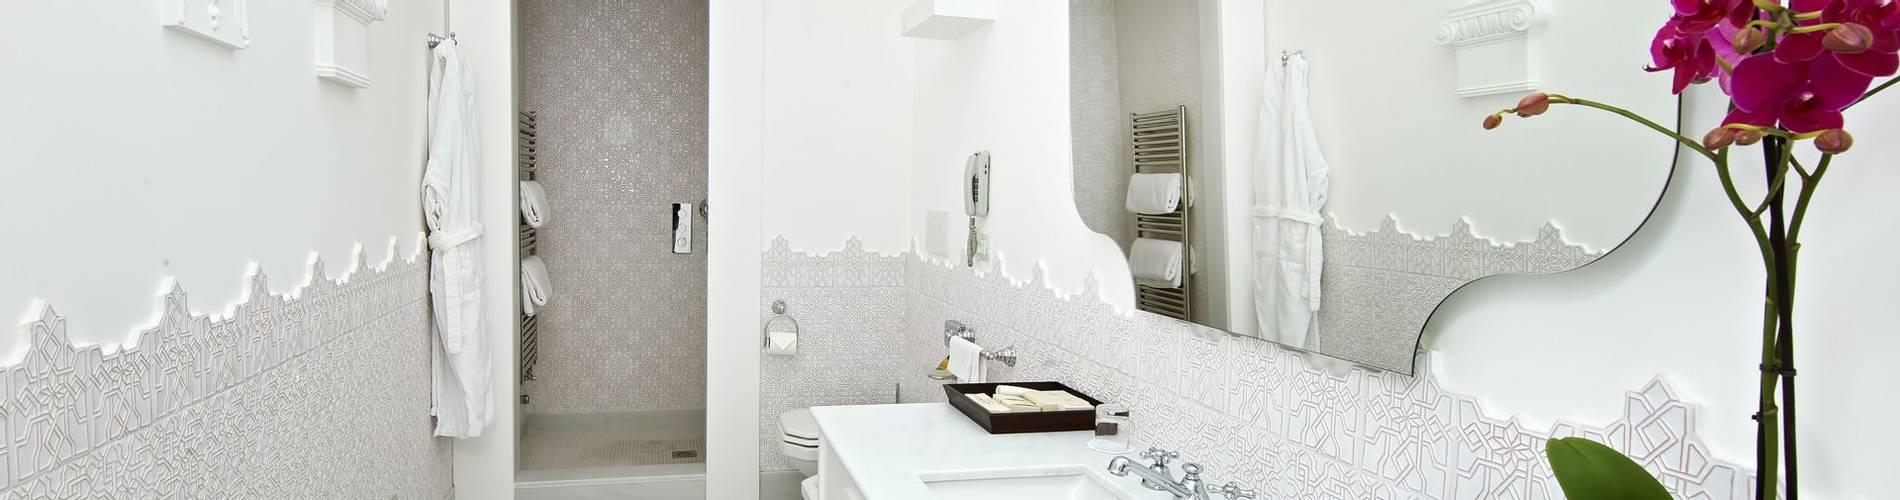 Bellevue Syrene, Sorrento, Italy, Camelia Suite (3).jpg